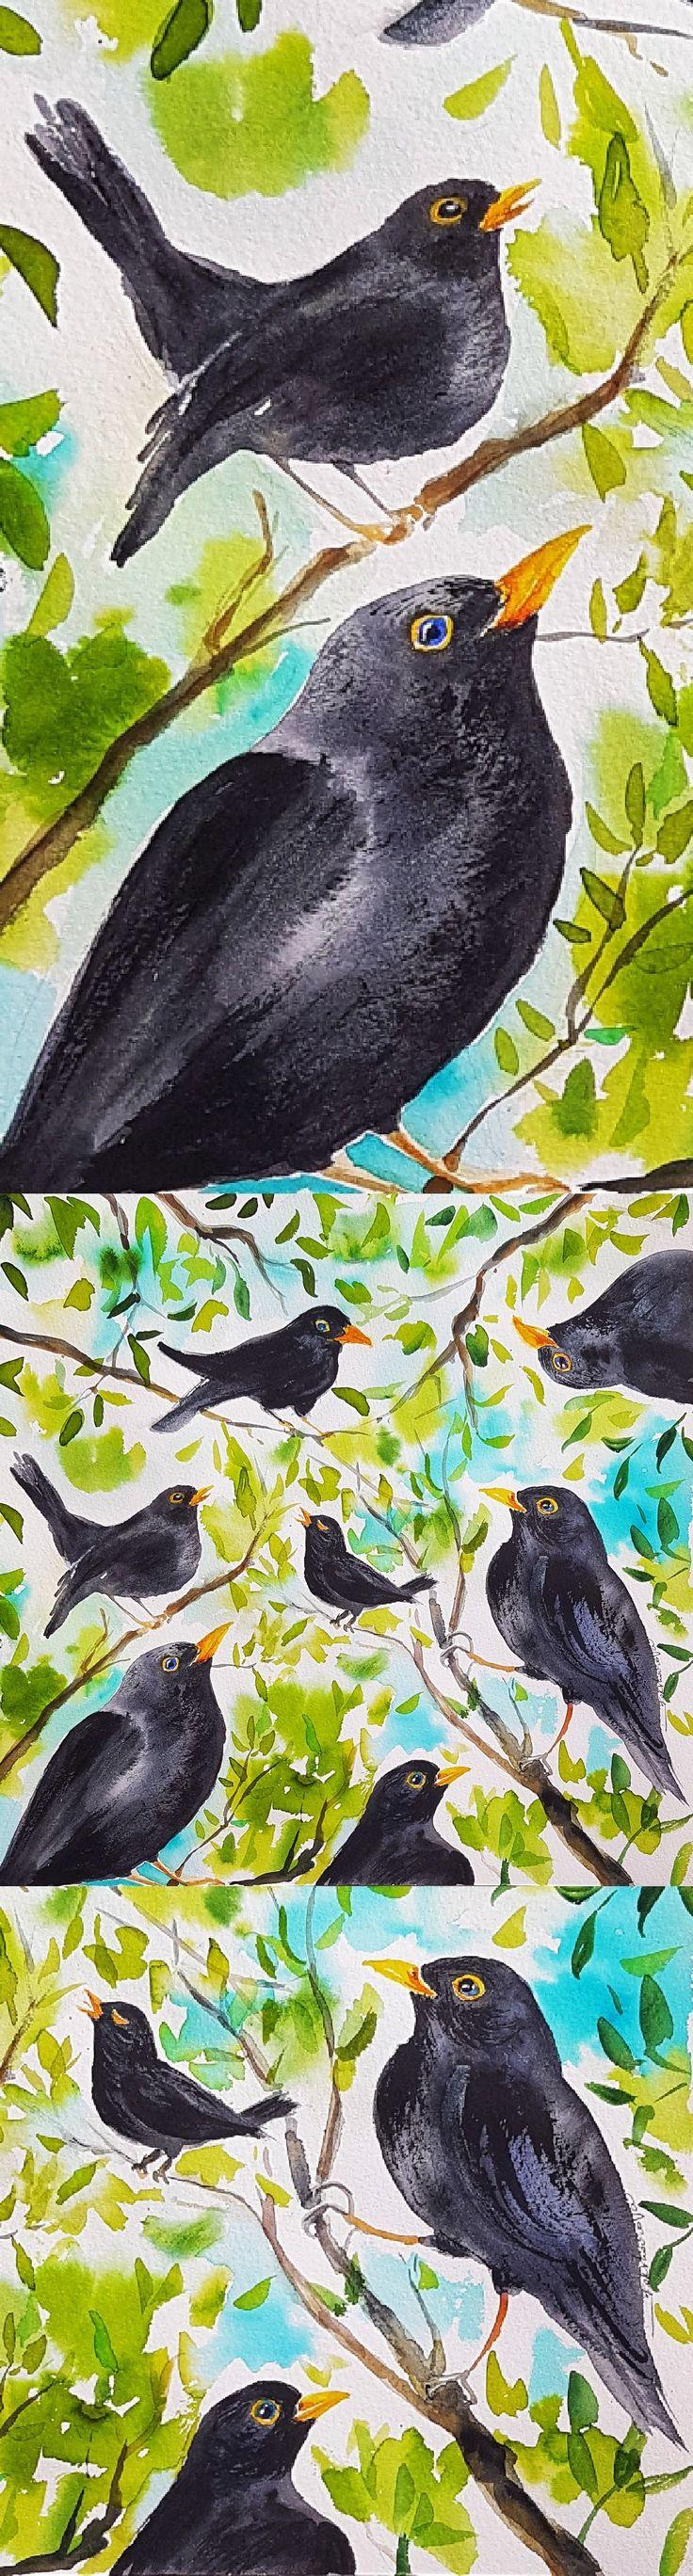 Blackbirds' song original watercolor painting 30*30cm ooak gift idea #ooak #gift #art #painting #homedecor #blackbird